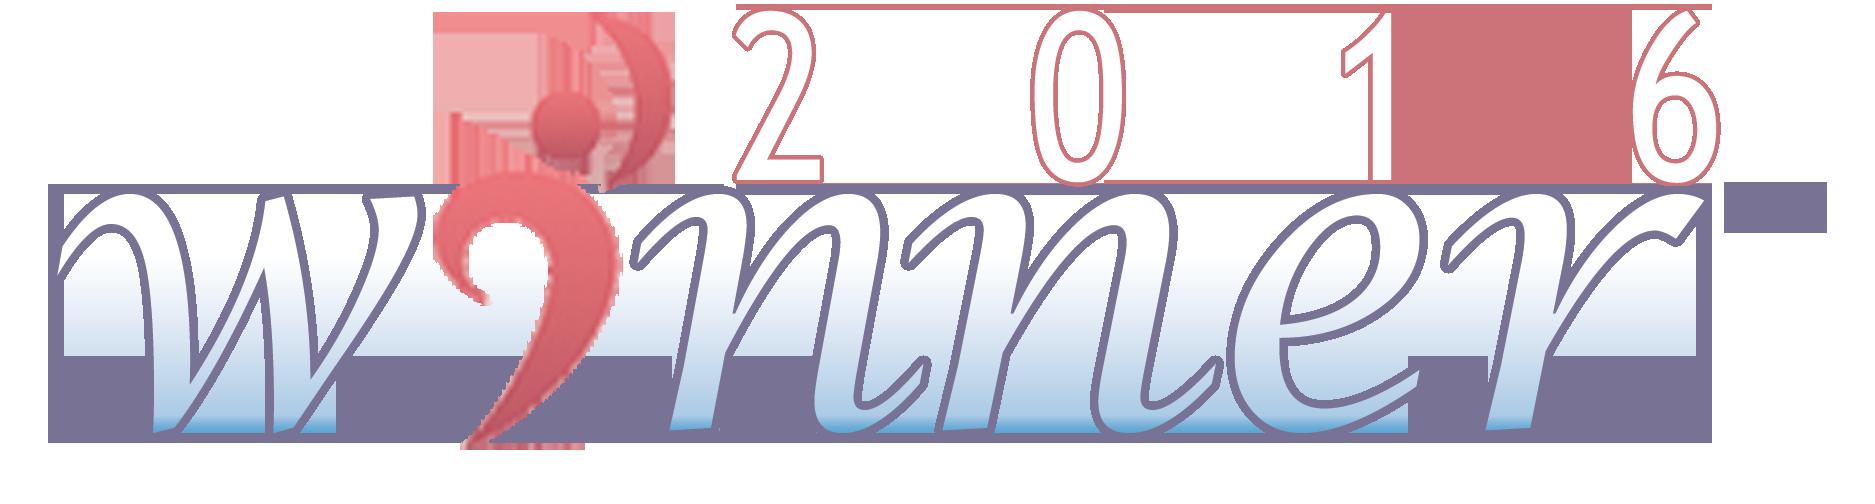 ProCAT Introduces Winner 2016!